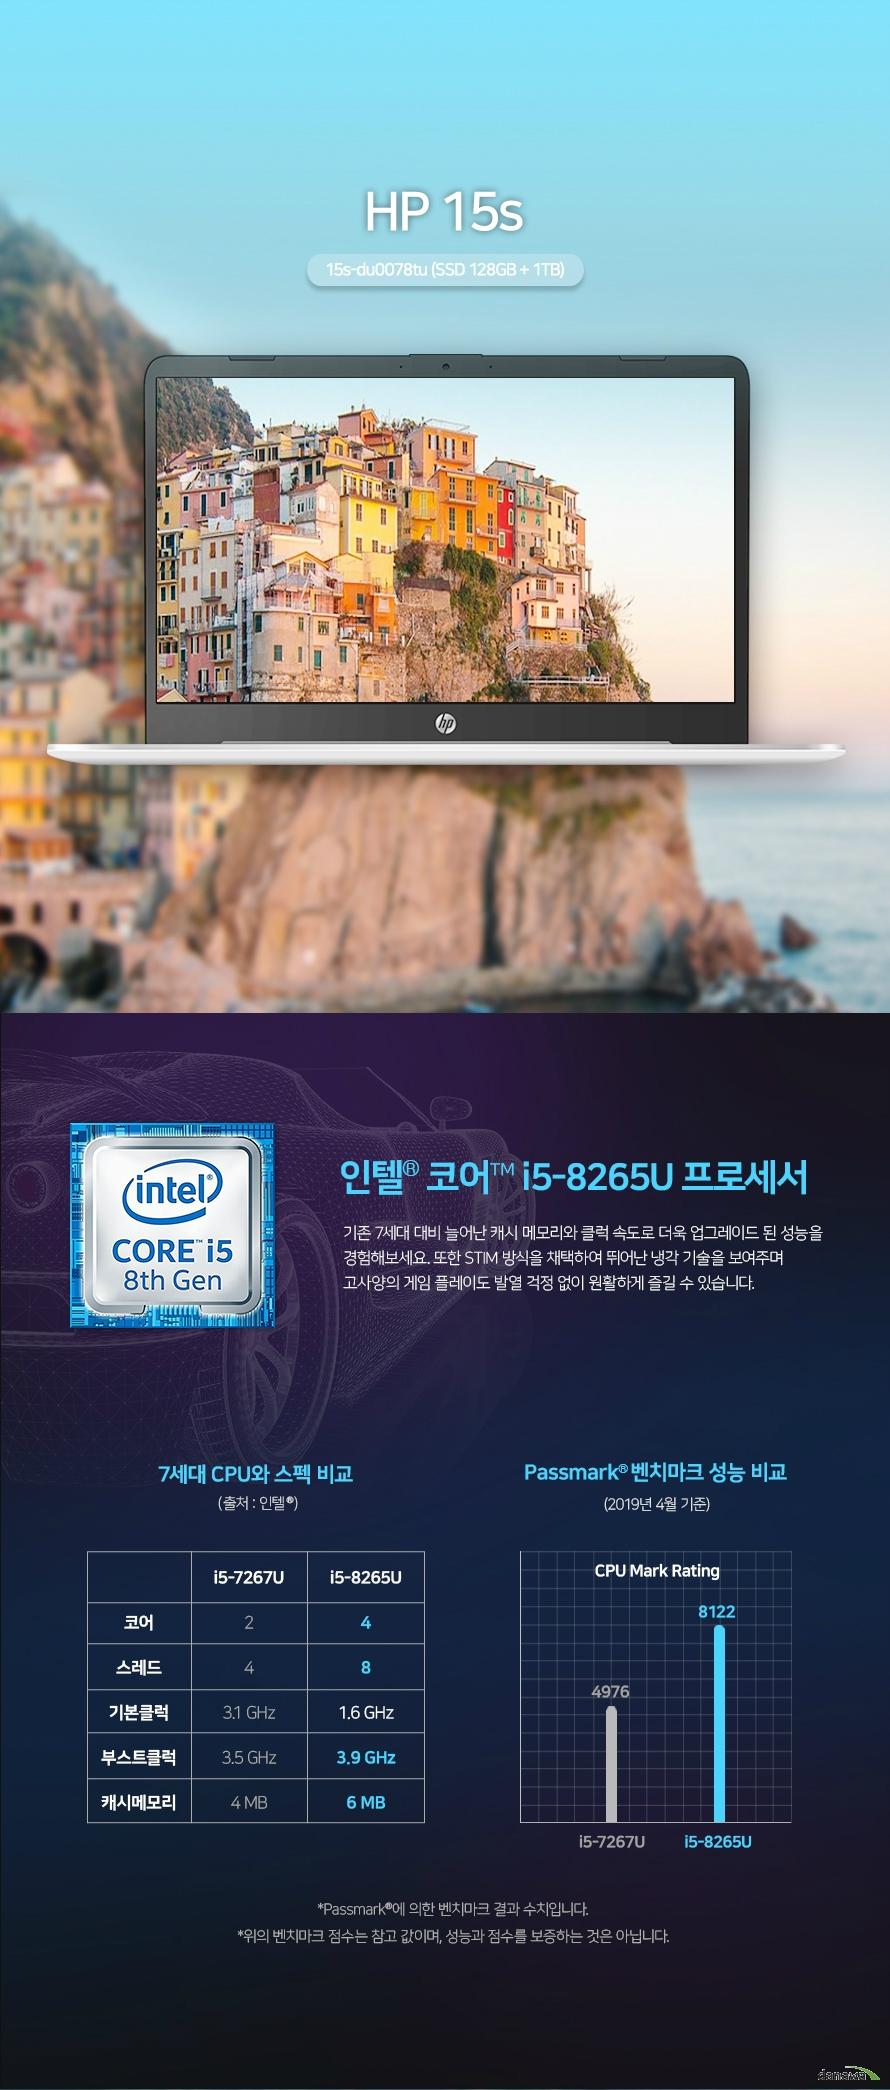 HP 15s-du0078tu (SSD 128GB + 1TB) 상세 스펙 인텔 / 코어i5-8세대 / 위스키레이크 / i5-8265U 1.6GHz(3.9GHz) / 쿼드 코어 / 39.62cm(15.6인치) / 1920x1080(FHD) / 눈부심방지 / 슬림형 베젤 / 4GB / DDR4 / 1TB / M.2 / 128GB / UHD 620 / VRAM:시스템메모리공유 / 유선랜 / 802.11 n/ac 무선랜 / 블루투스 4.2 / HDMI / 웹캠 / USB Type-C / USB 3.0 / 숫자 키패드 / 블록 키보드 / 41Wh / 운영체제 미포함 / 두께:19.9mm / 1.74Kg / 용도: 사무/인강용